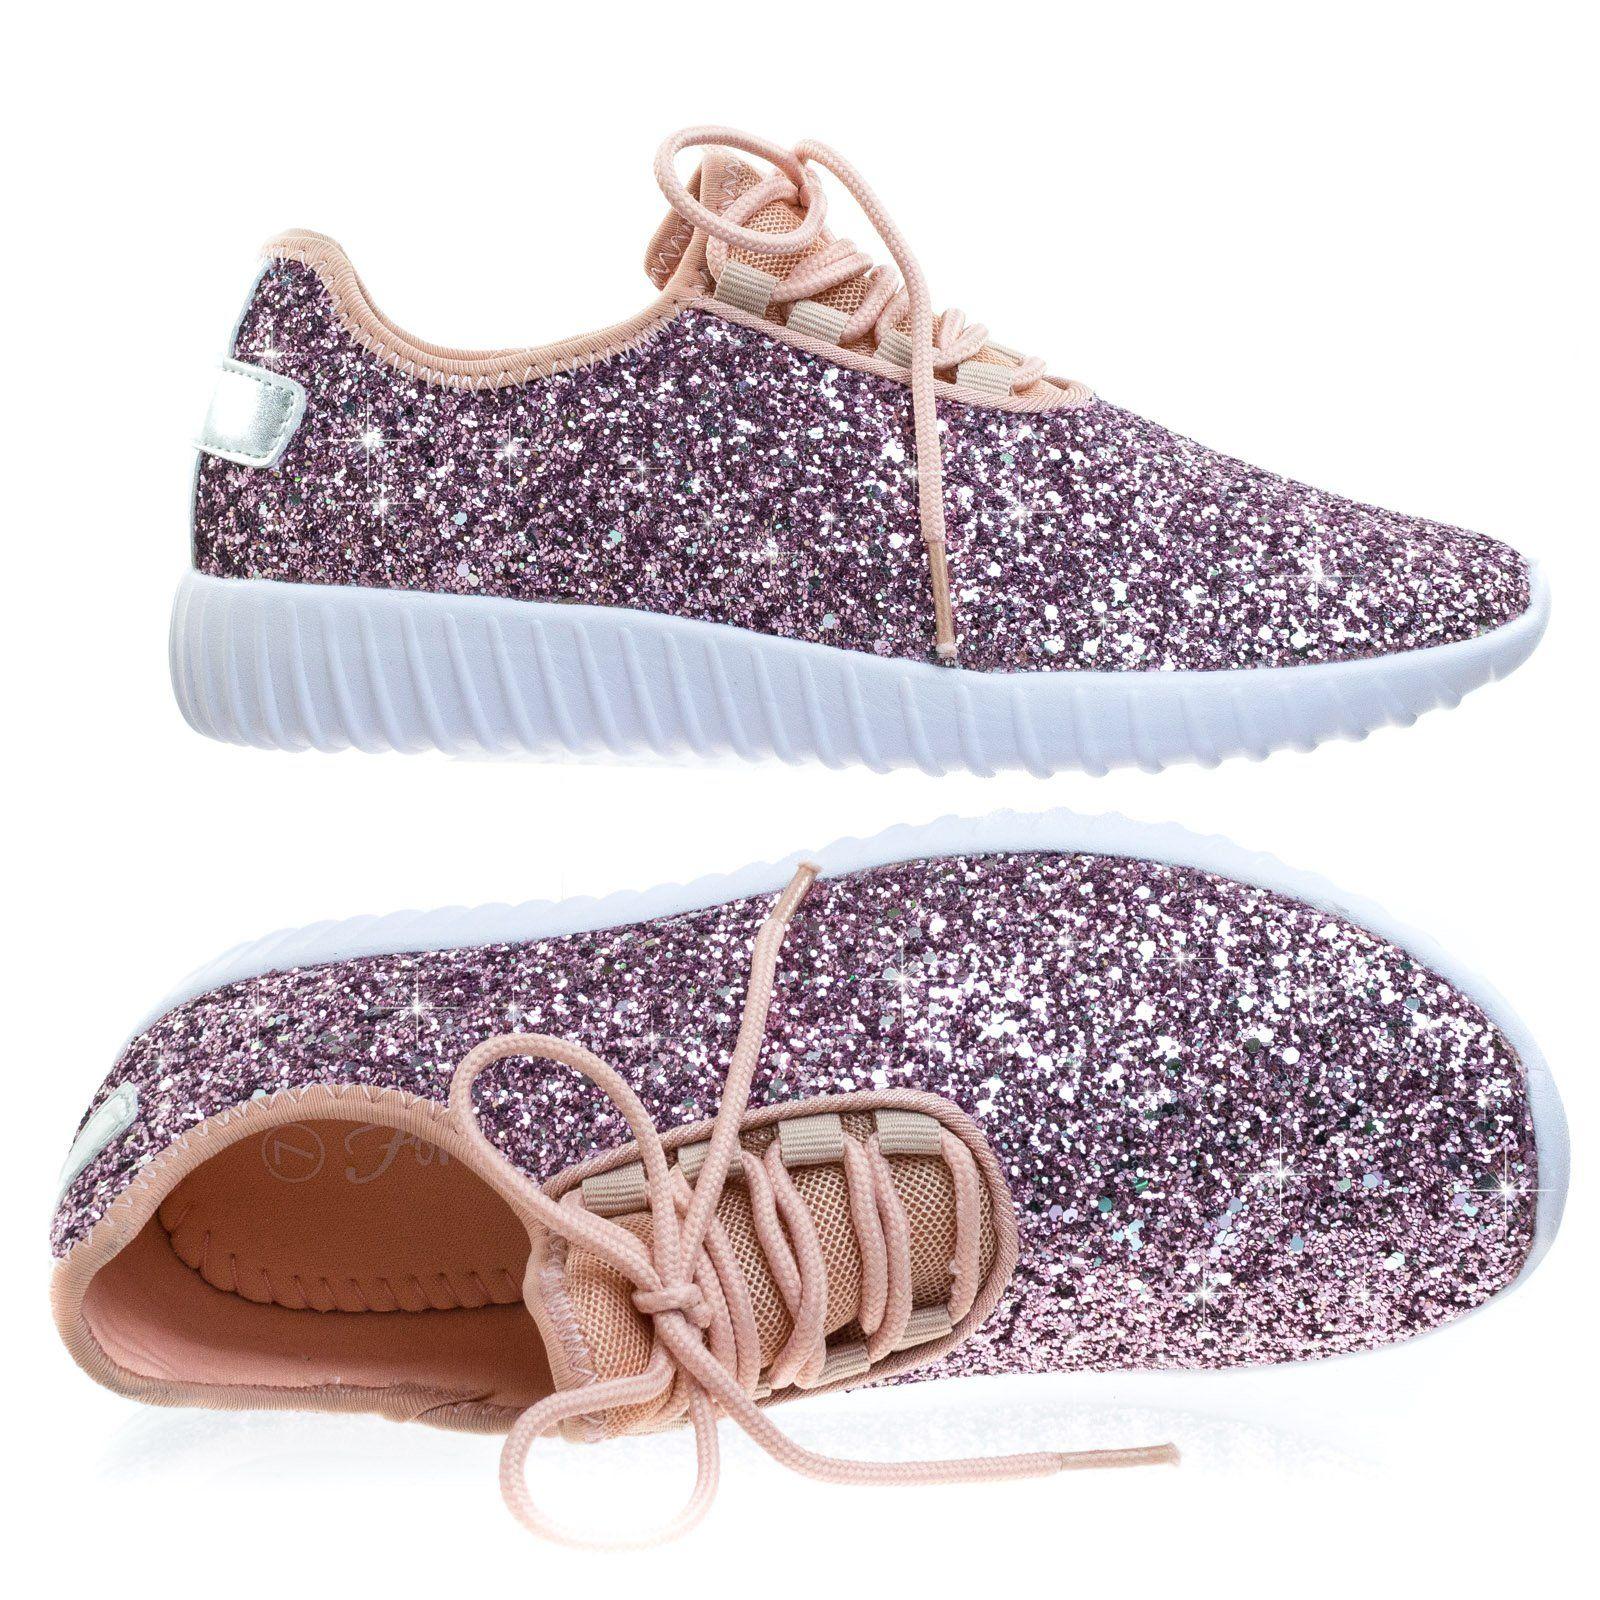 Lace up Rock Glitter Fashion Sneaker